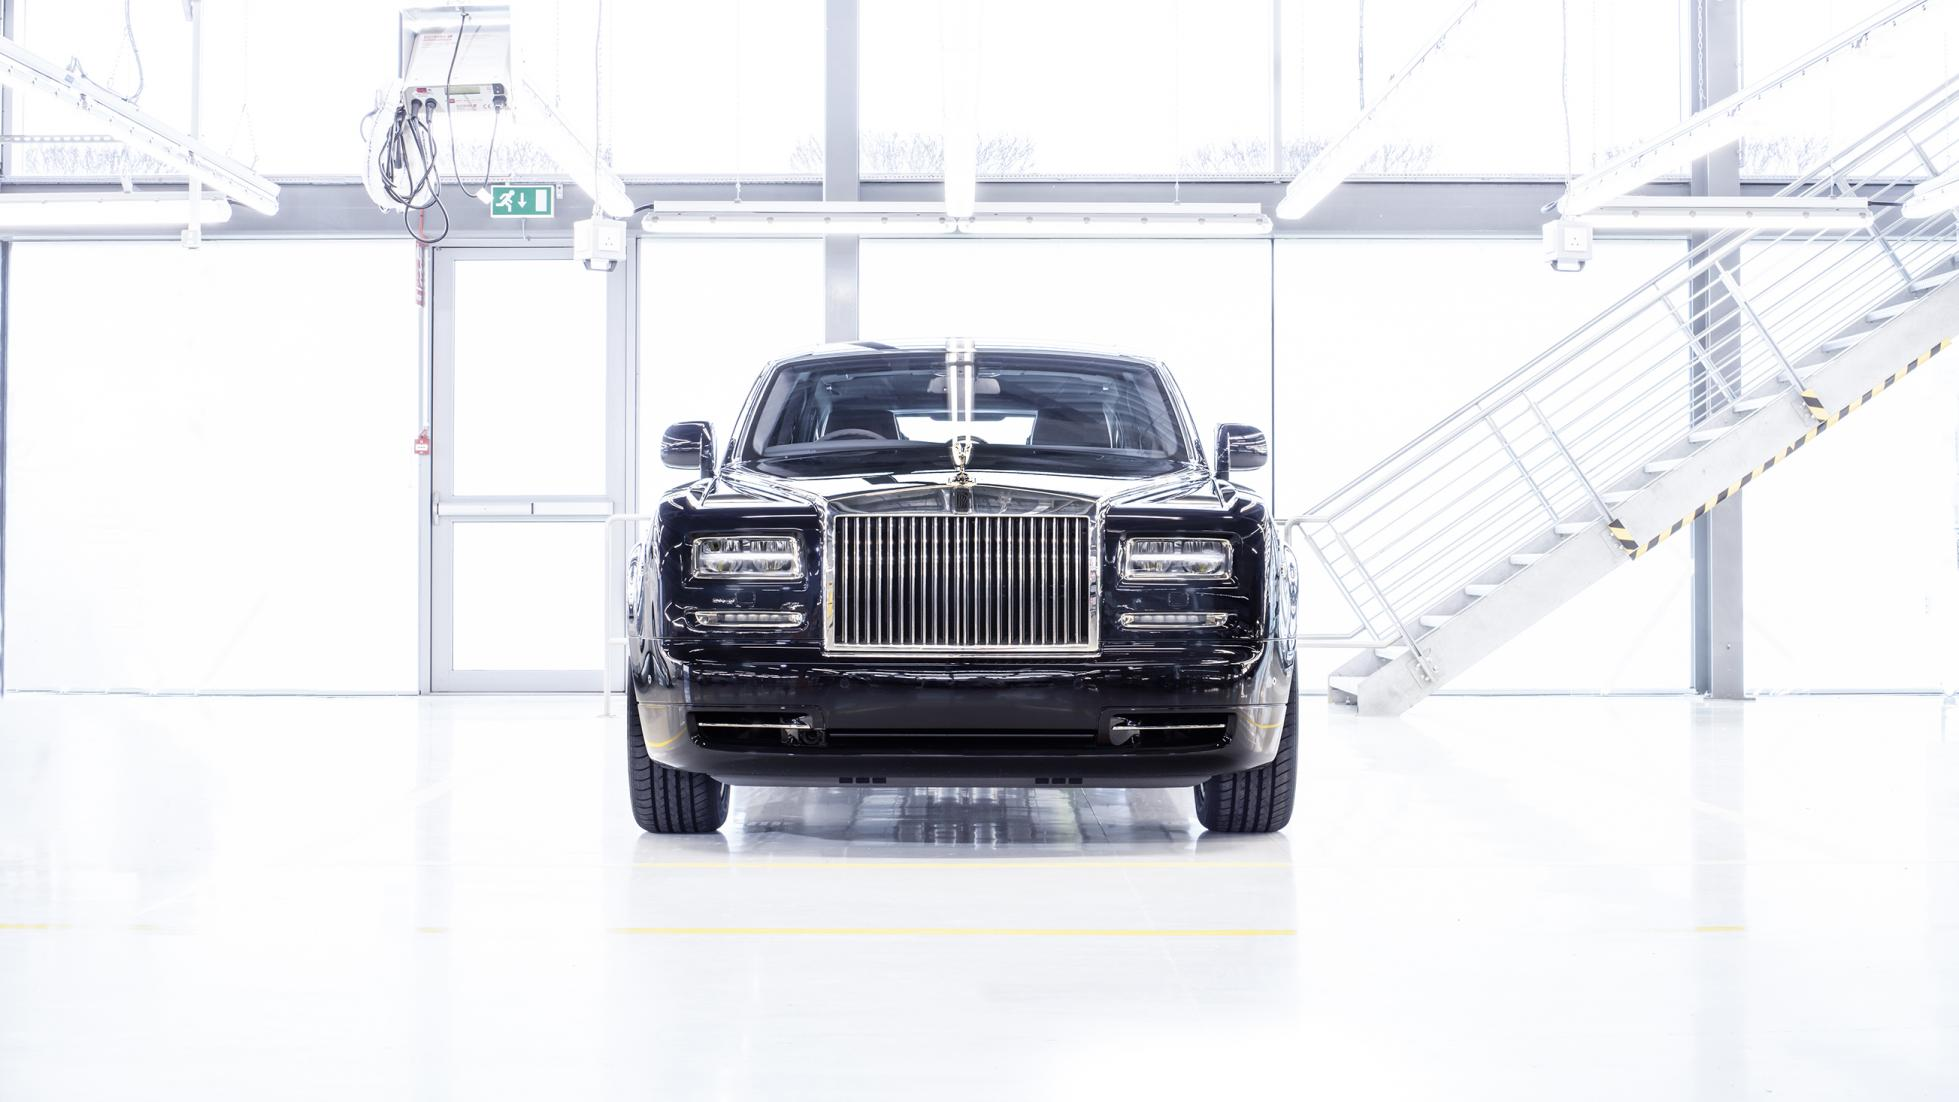 Rolls-Royce Phantom Last Unit